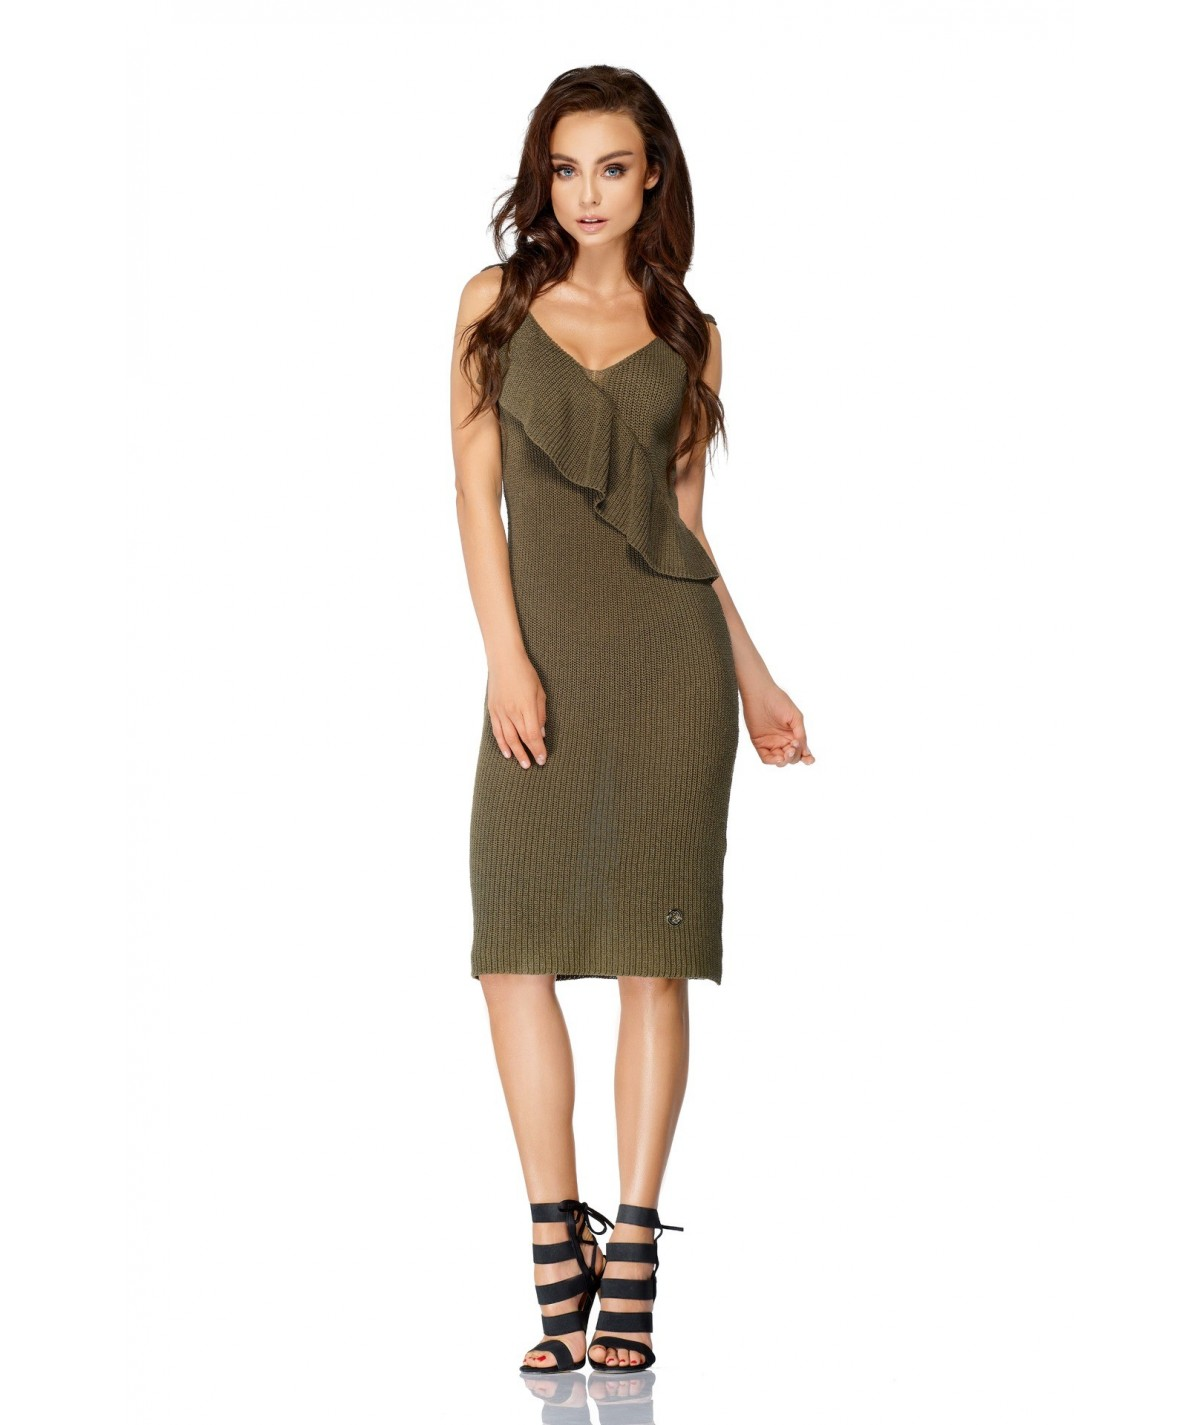 Dopasowana sukienka na plażę Lemoniade Model LSG102